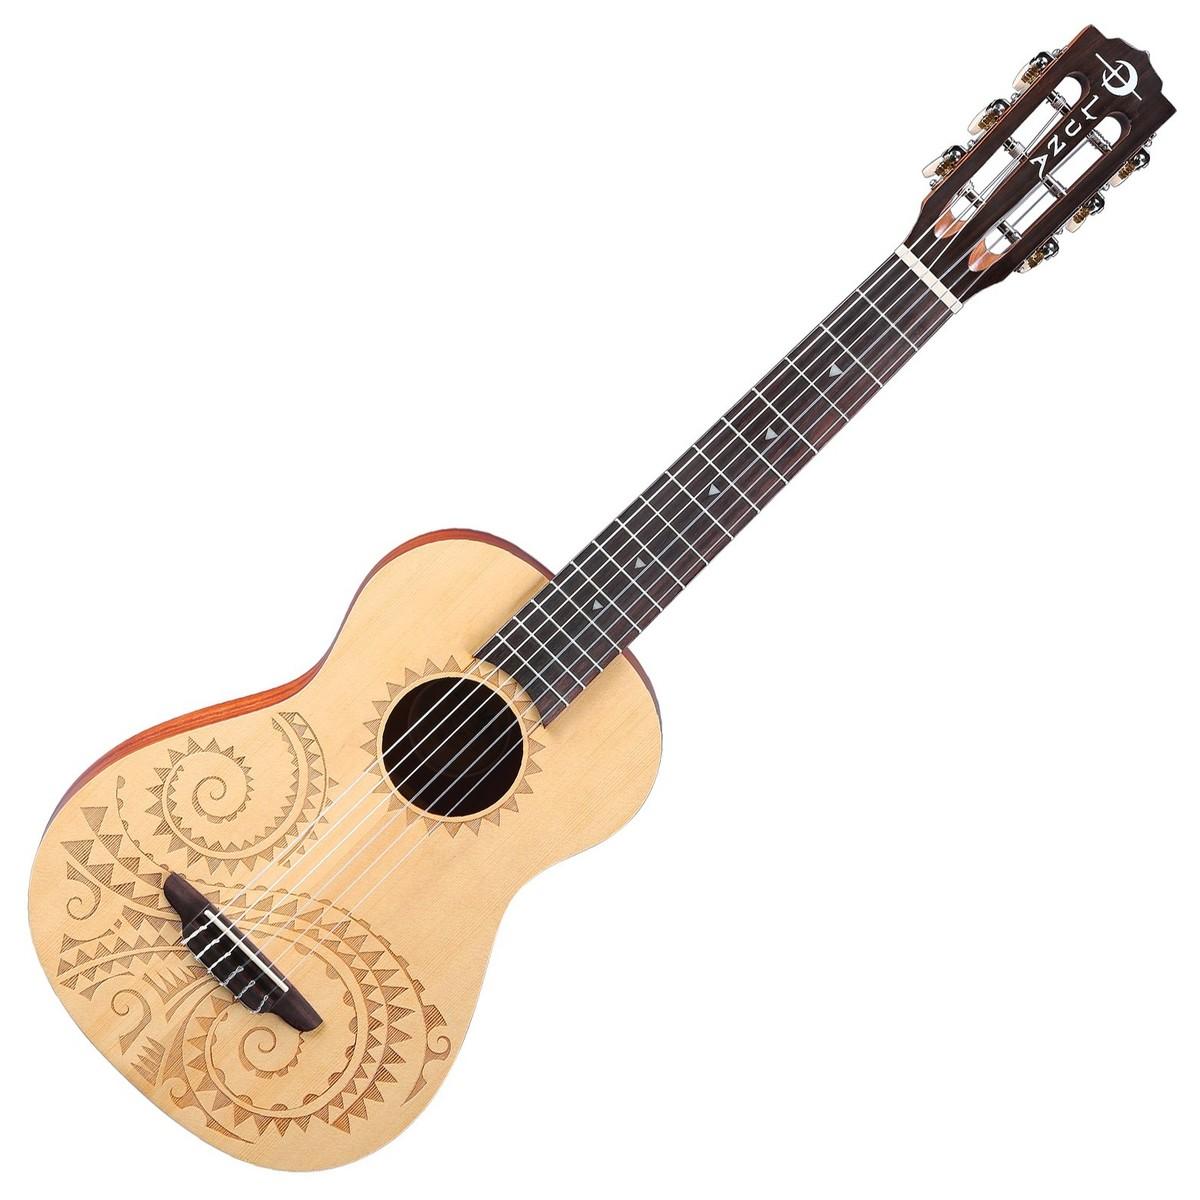 luna tattoo 6 string baritone ukulele at gear4music. Black Bedroom Furniture Sets. Home Design Ideas